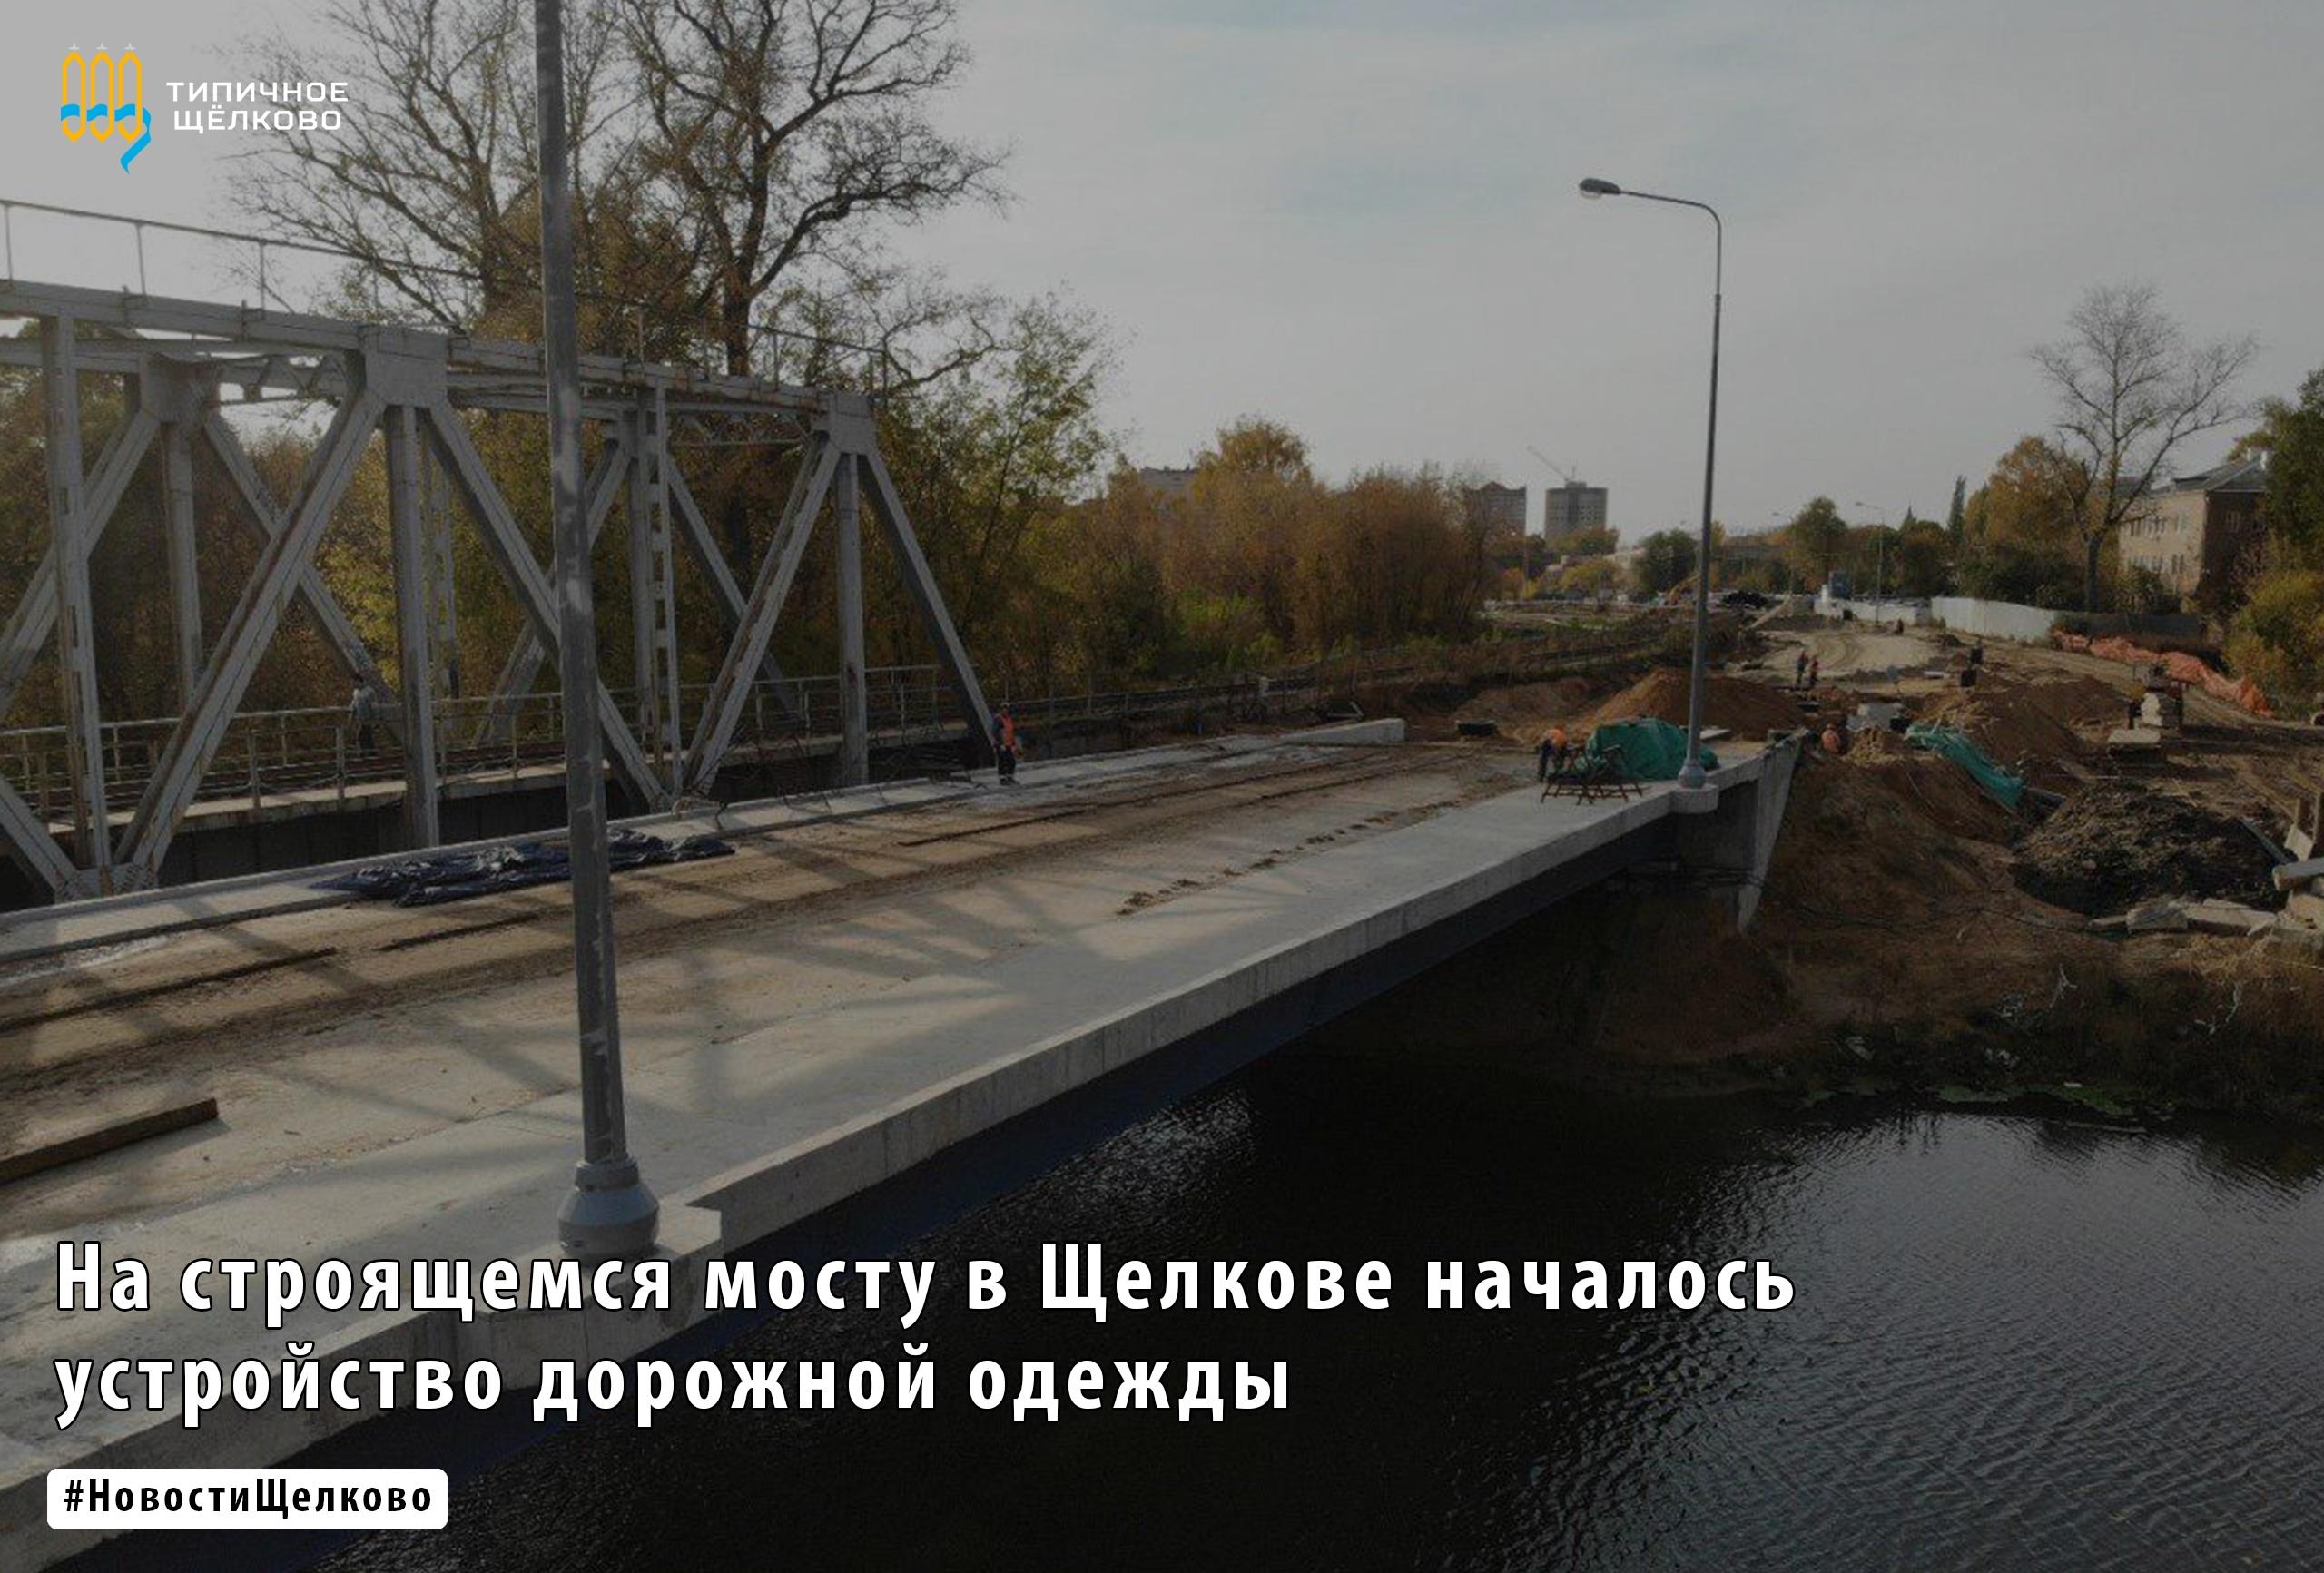 На строящемся мостовом переходе через р. Клязьму